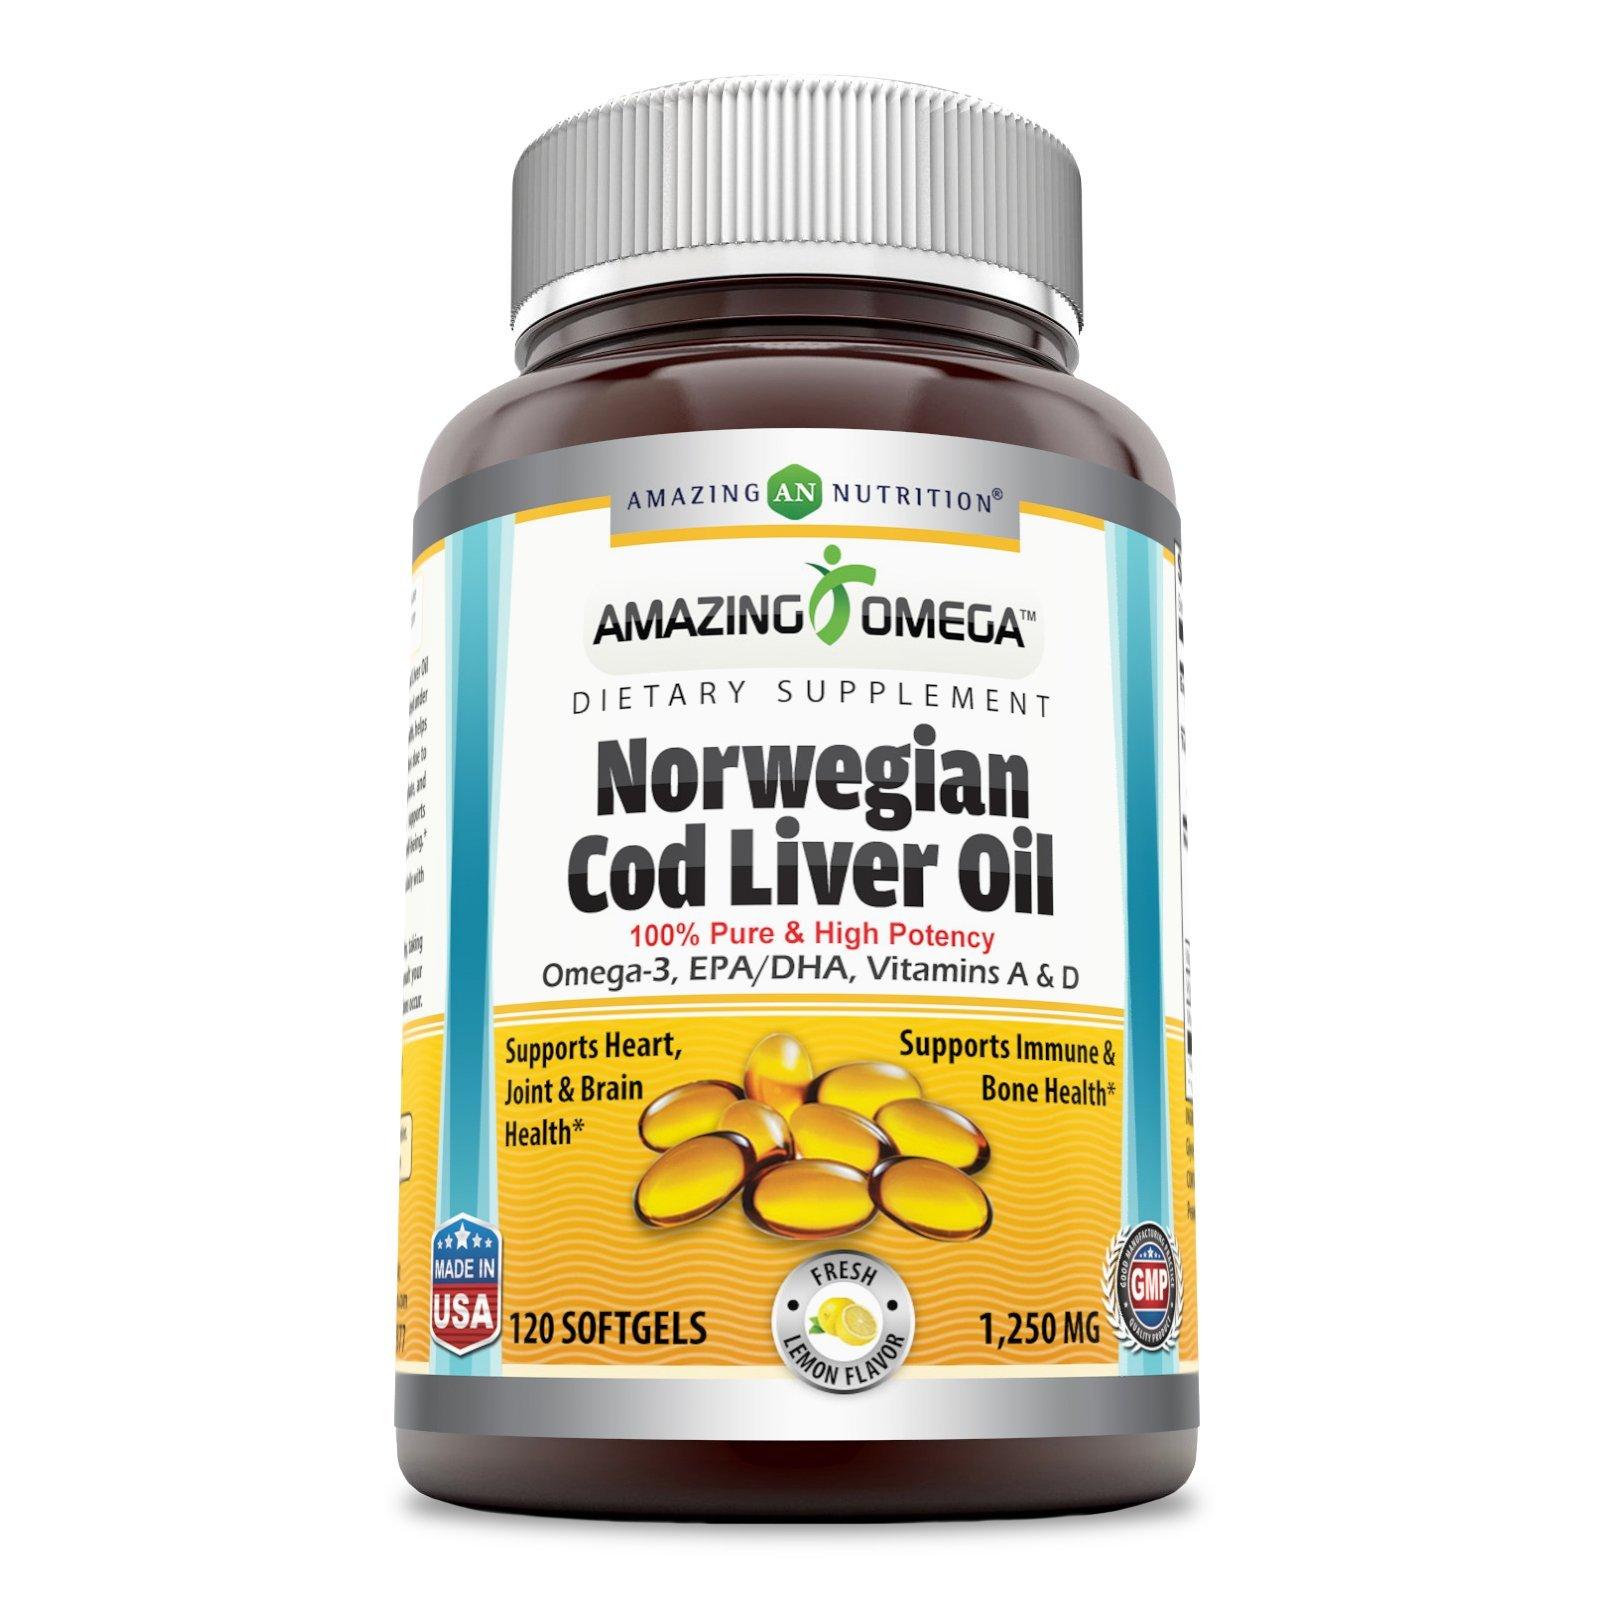 Amazing Omega Norwegian Cod Liver